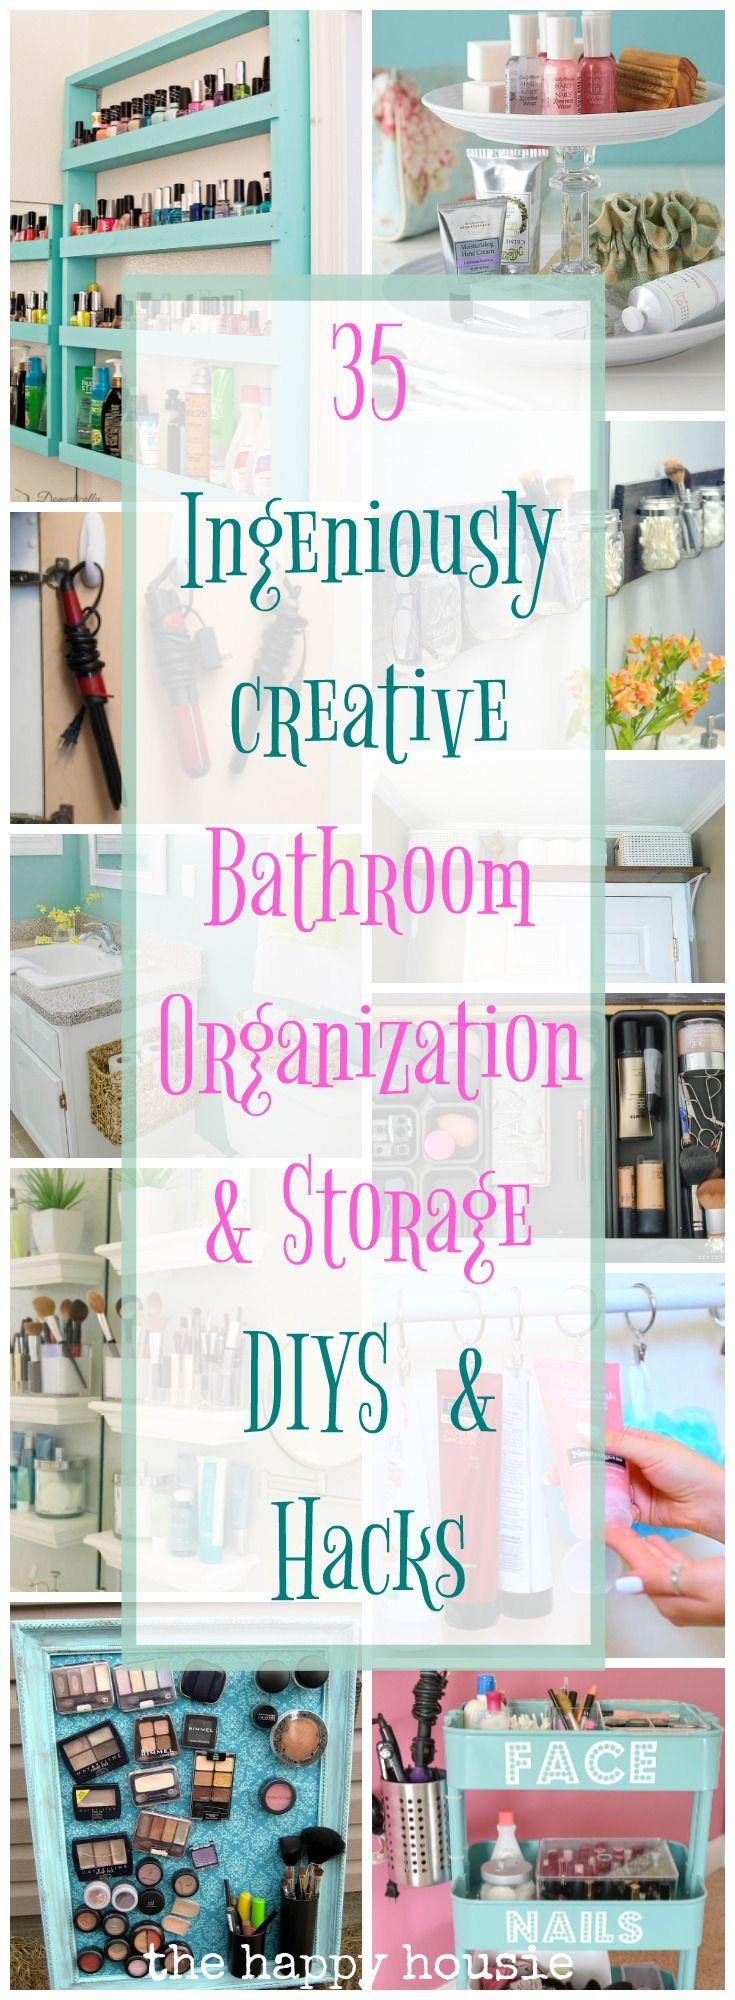 Photo of Ingenious Ideas & DIYs for Bathroom Organization & Storage | The Happy Housie